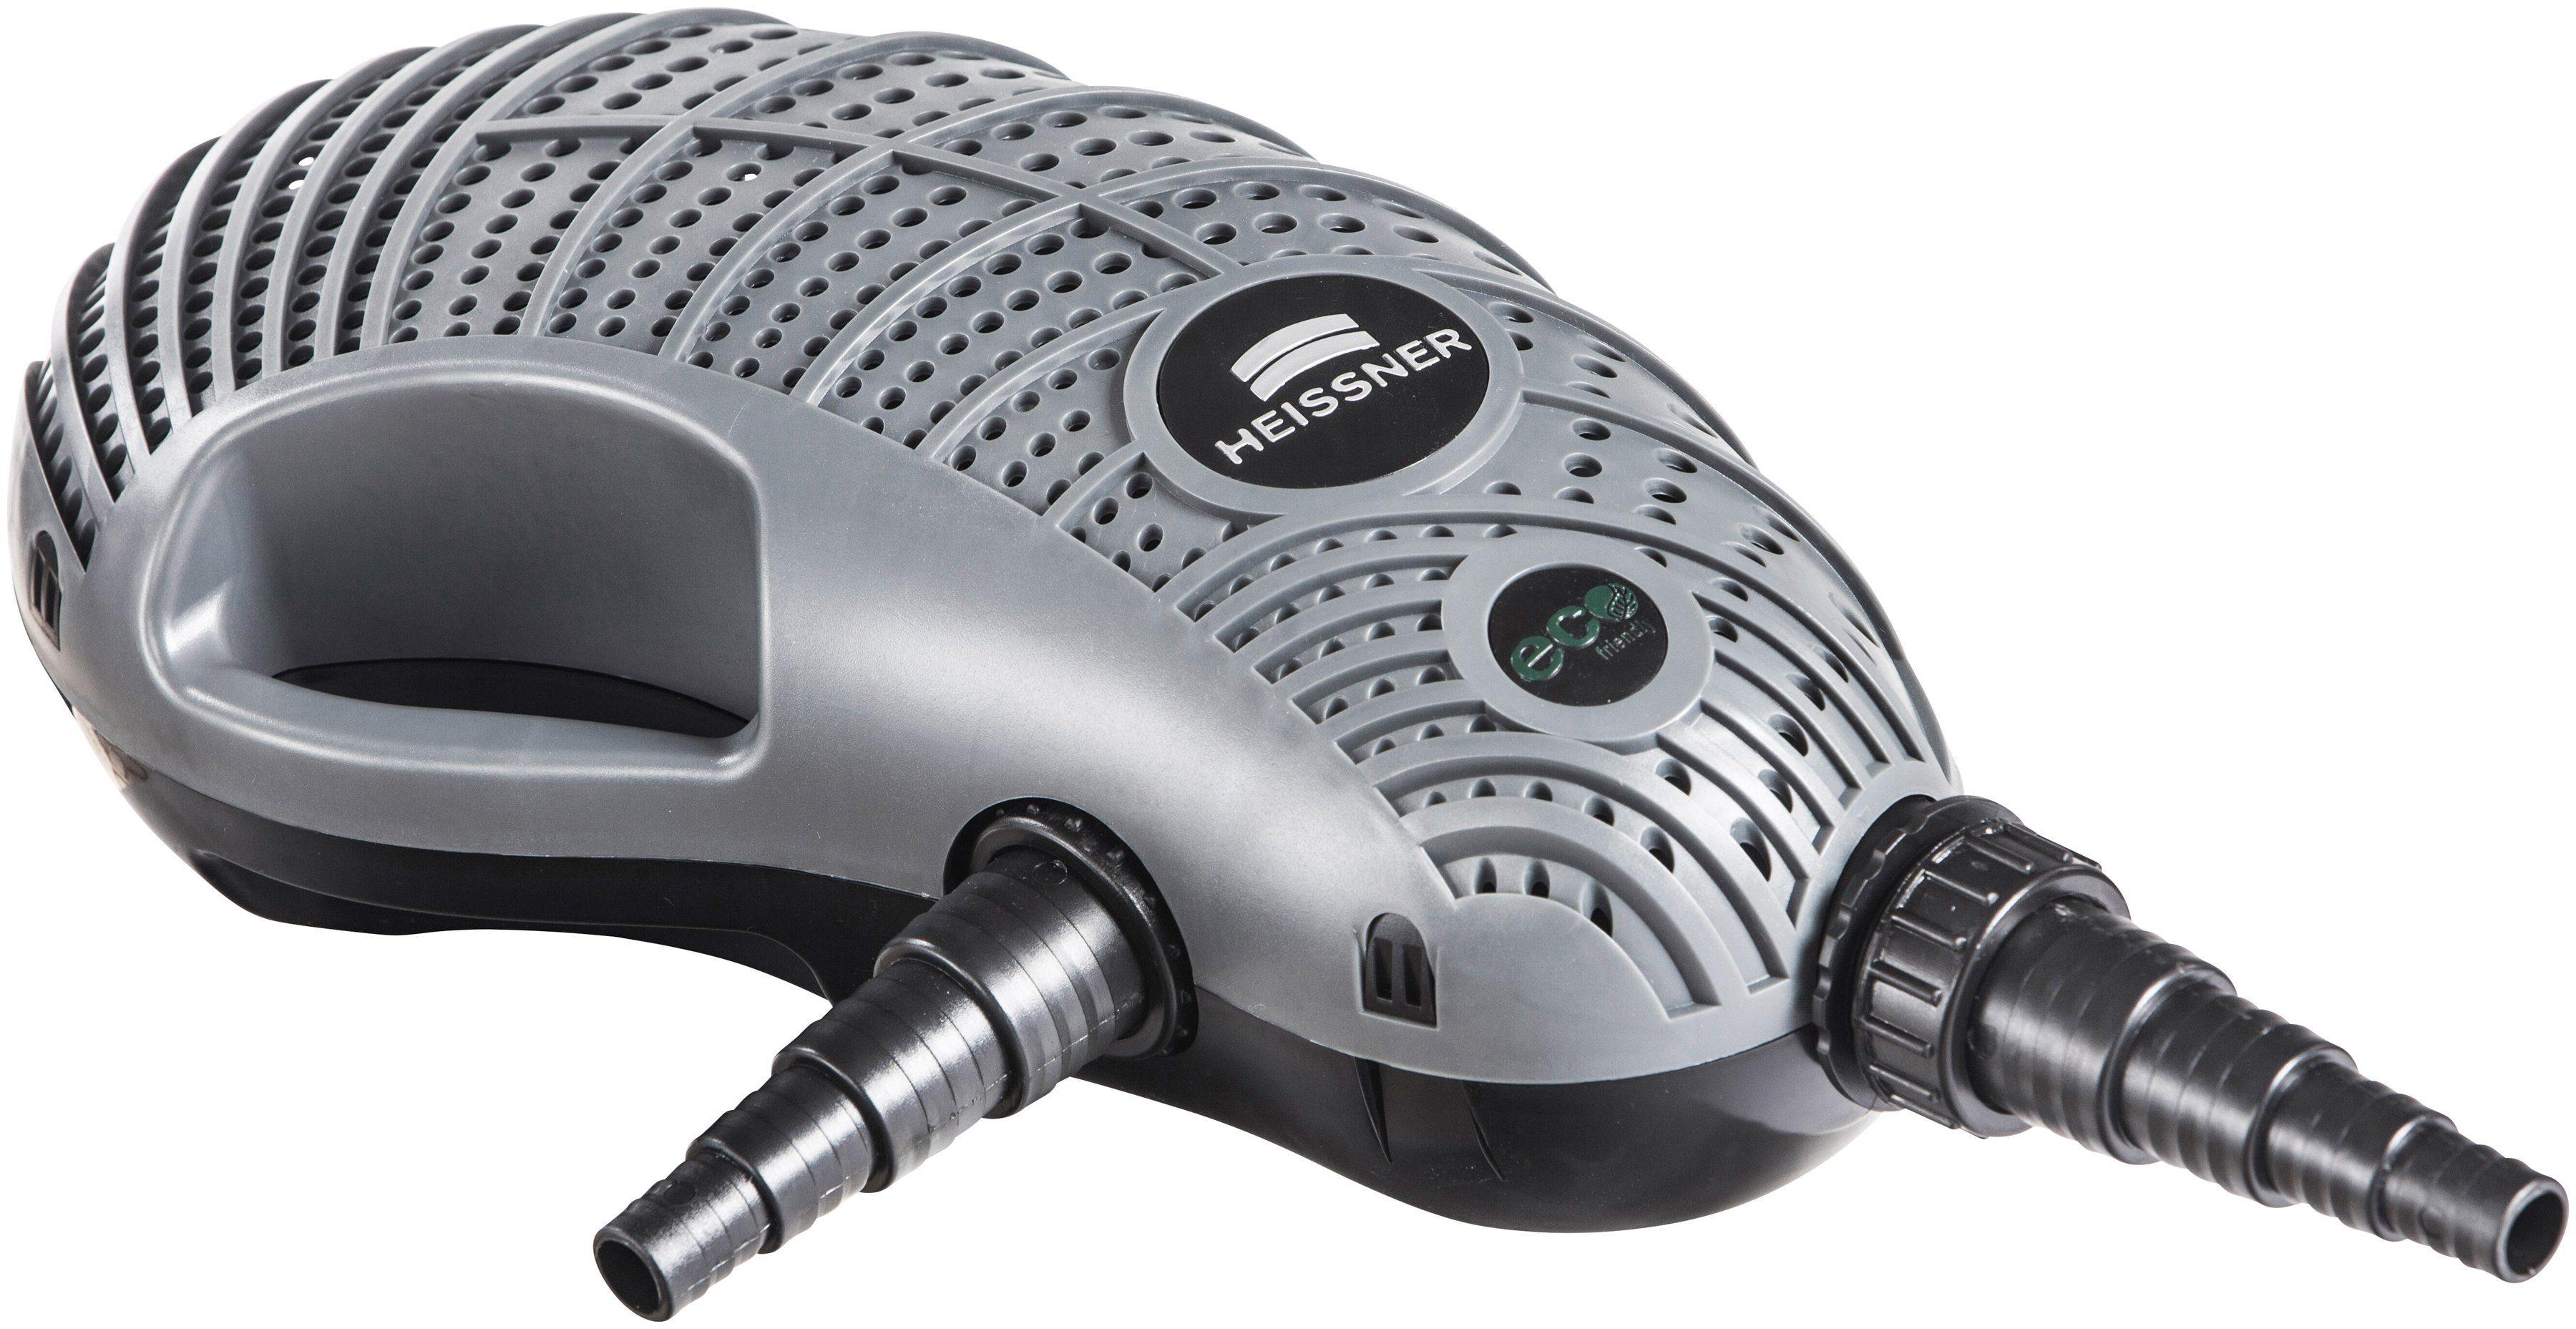 HEISSNER Filter- und Bachlaufpumpe »P5100E-00 AQUA CRAFT«, 4800 l/h